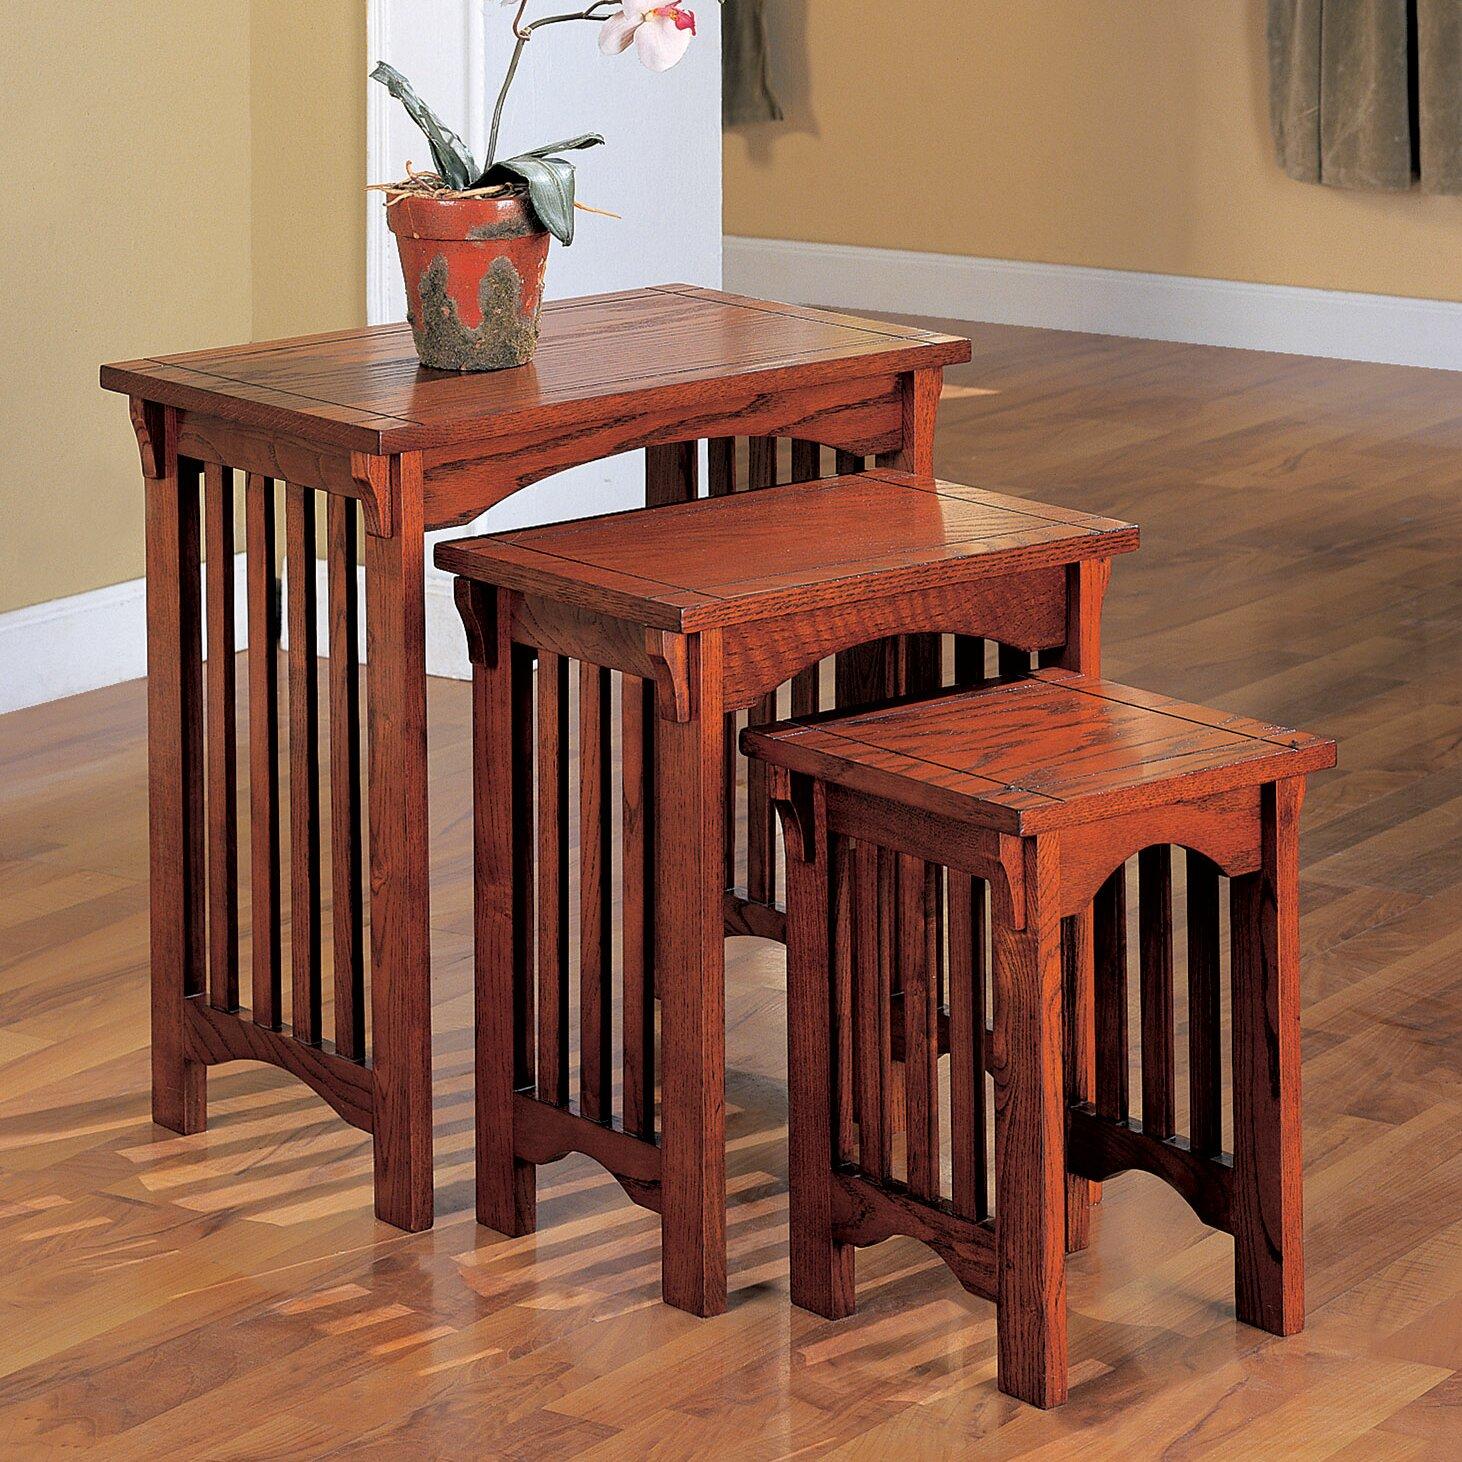 charlton home 3 piece nesting table set reviews wayfair. Black Bedroom Furniture Sets. Home Design Ideas